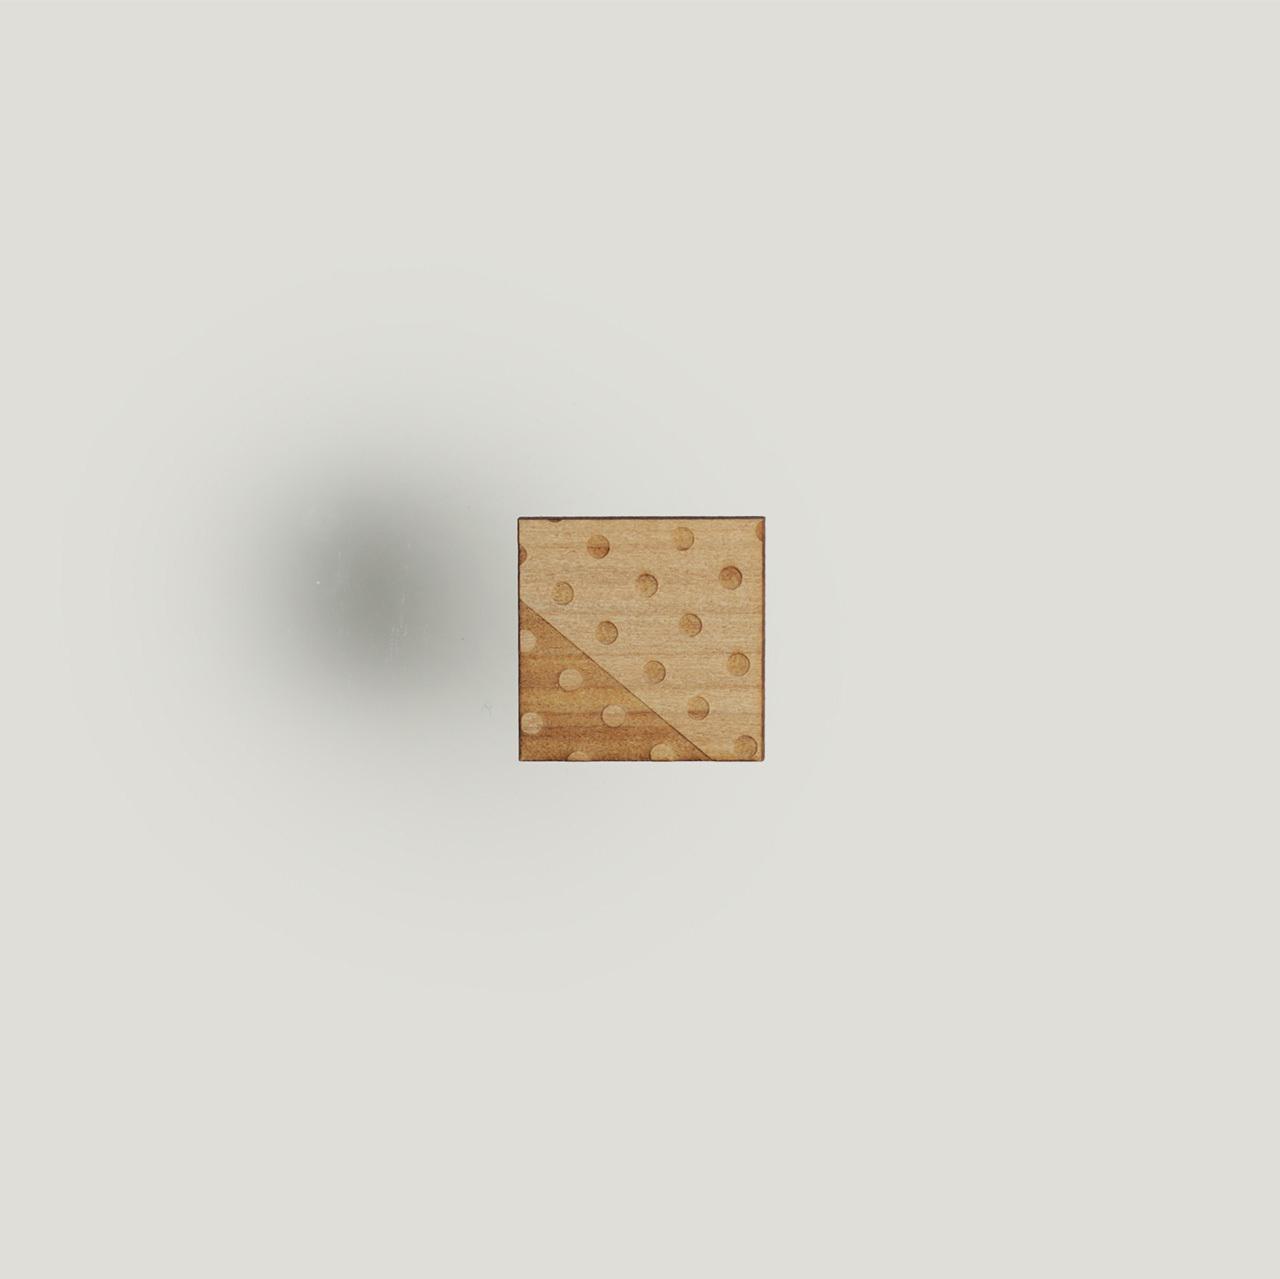 brooch square dot / しかくドットブローチ